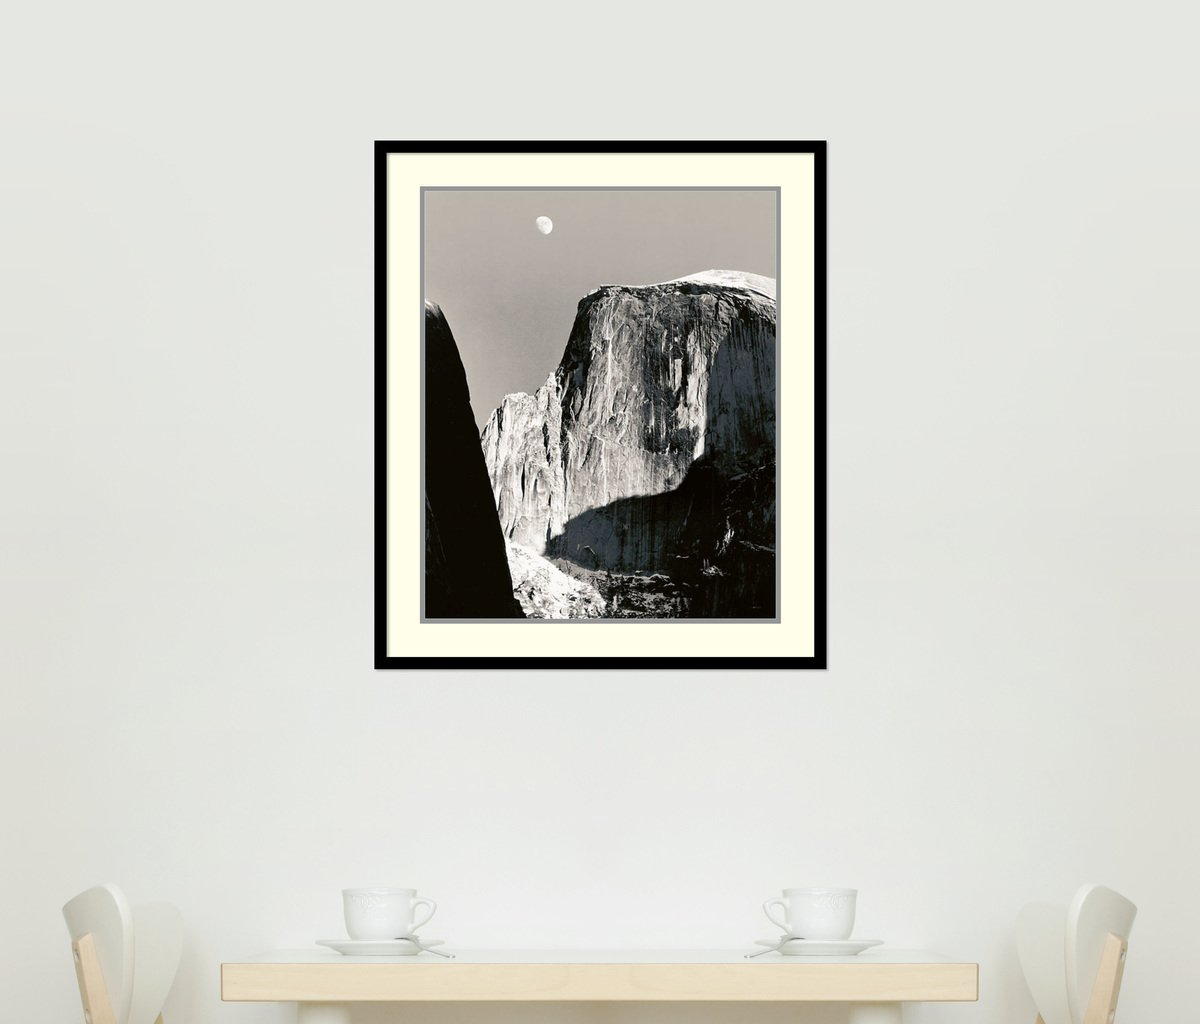 Amazon.com: Framed Art Print, Moon Over Half Dome\' by Ansel Adams ...